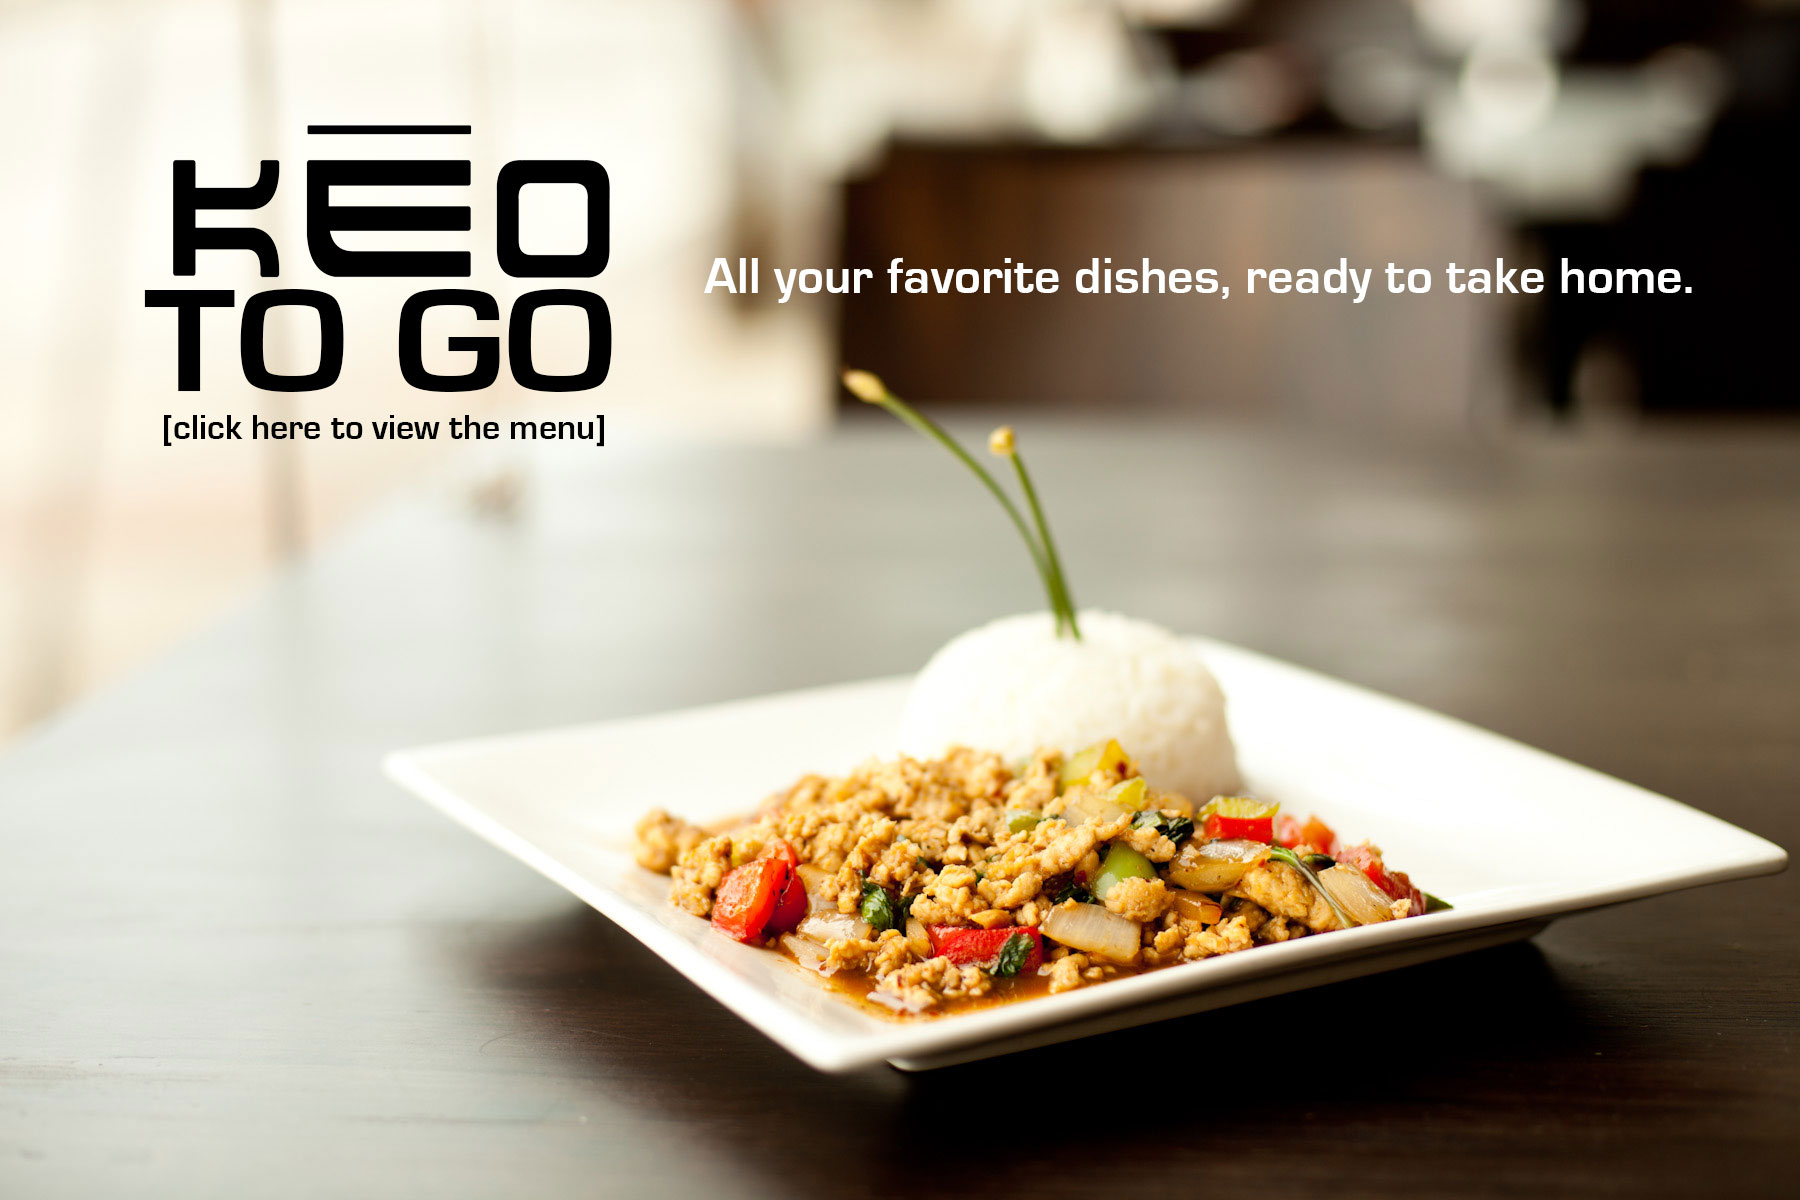 keo-togo-promo.jpg